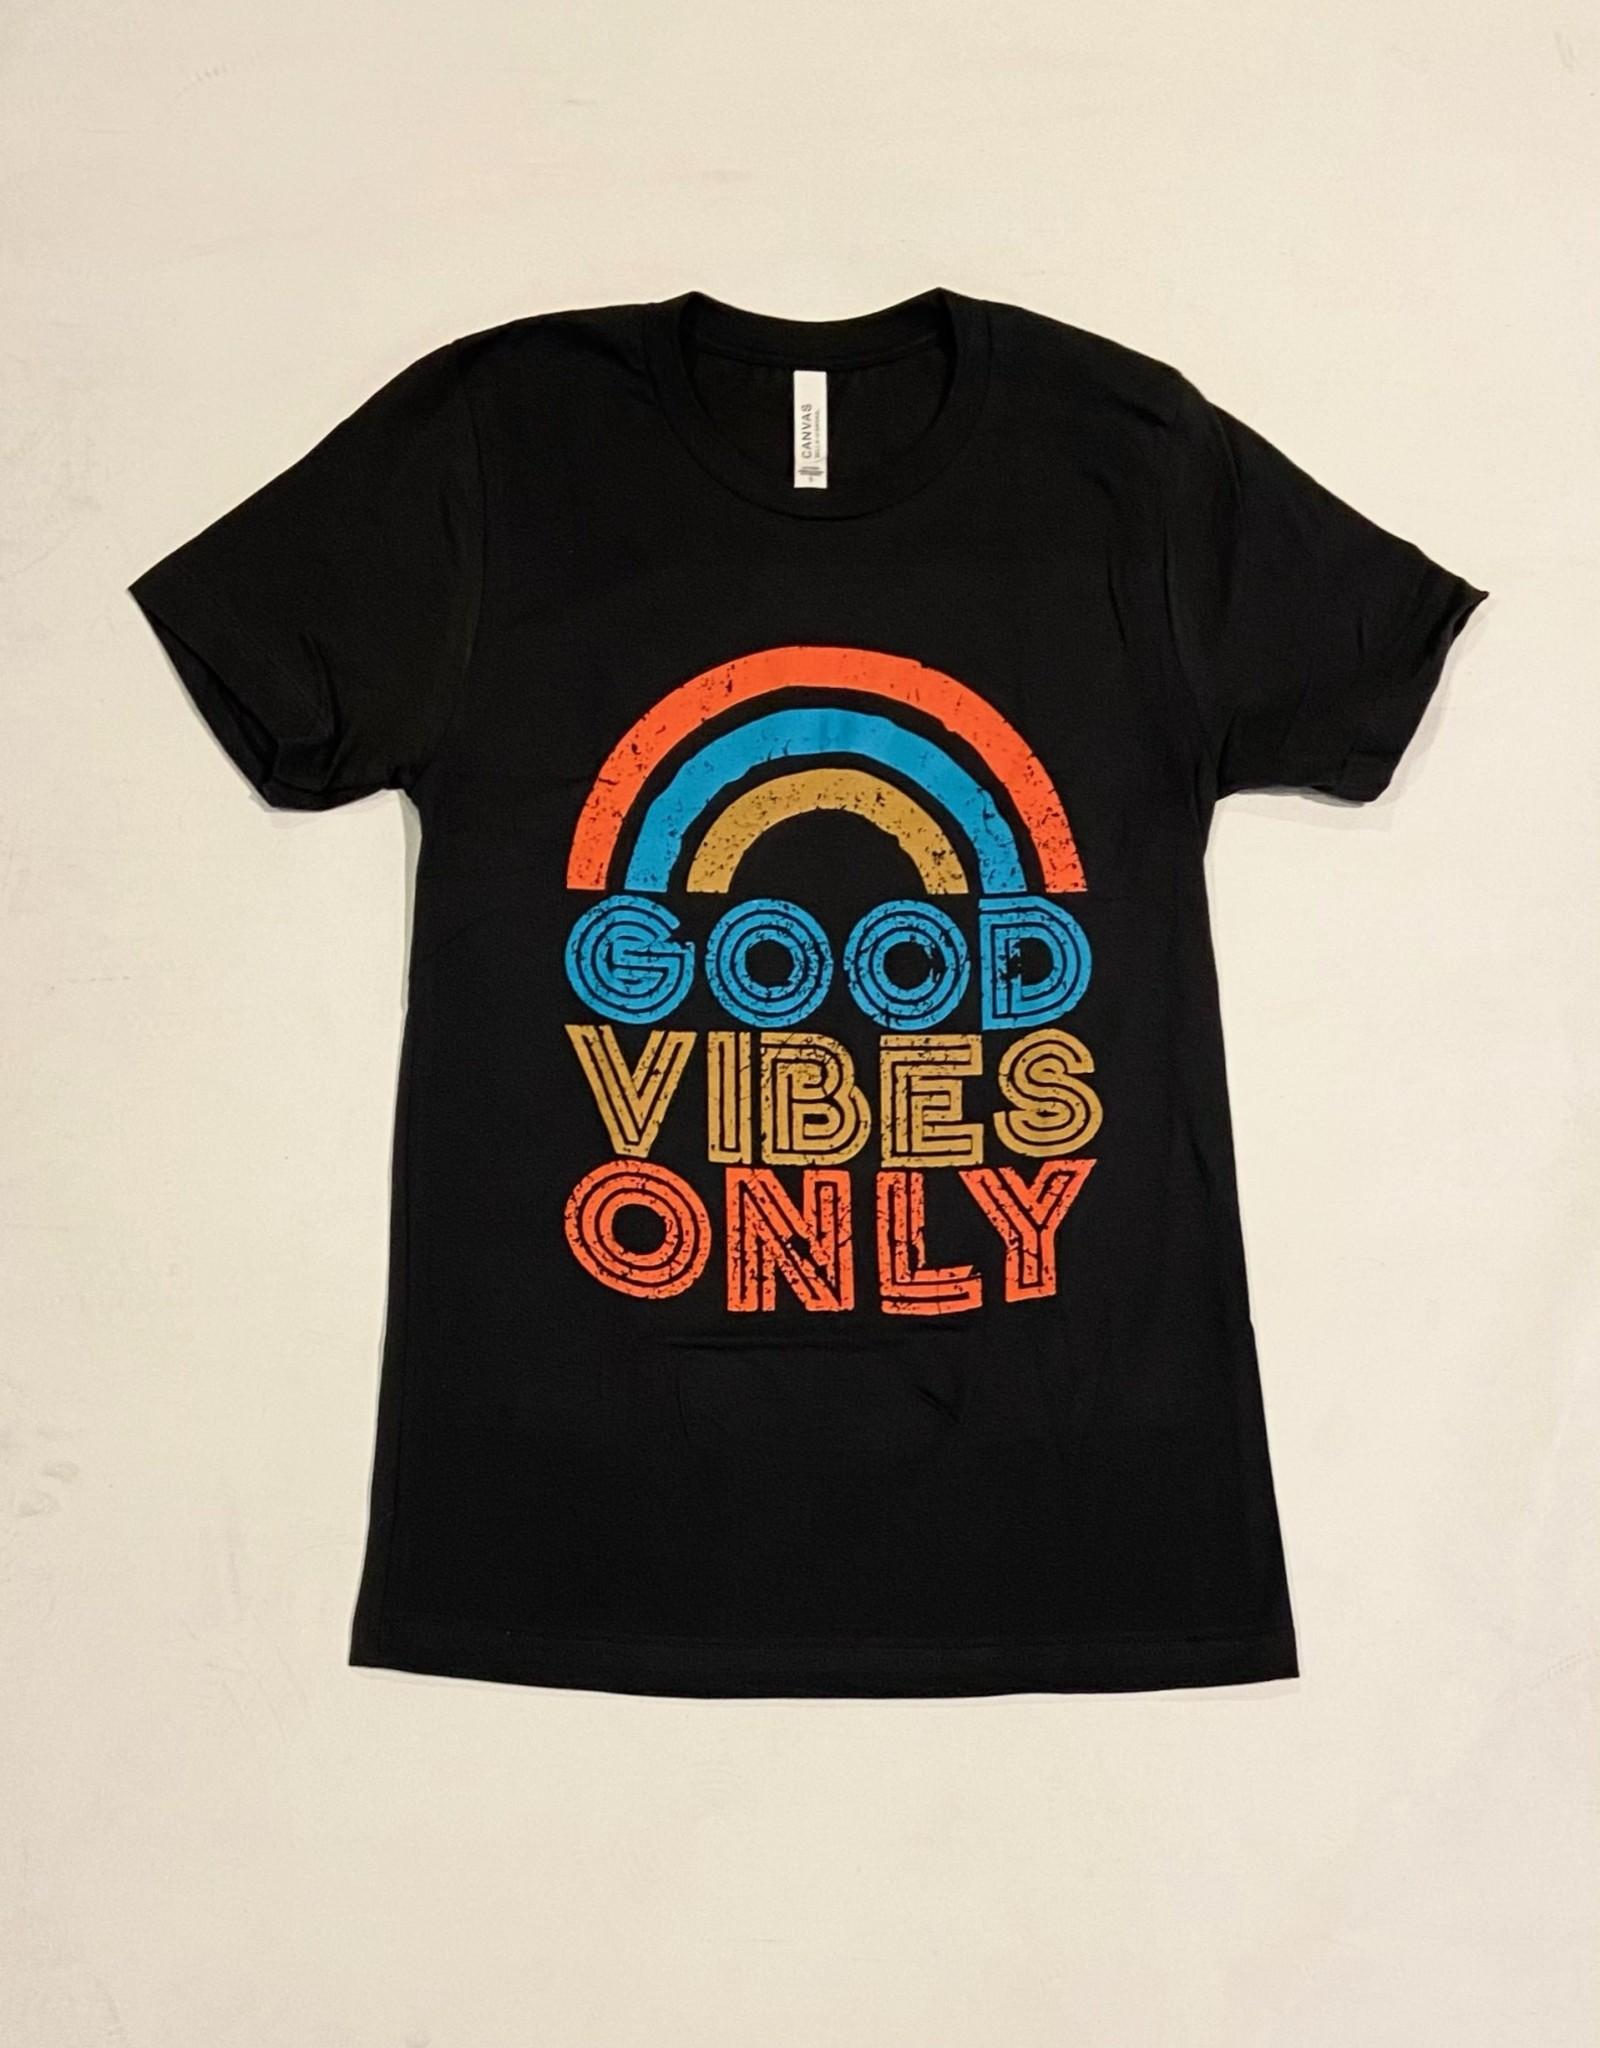 inked up apparel good vibes tshirt